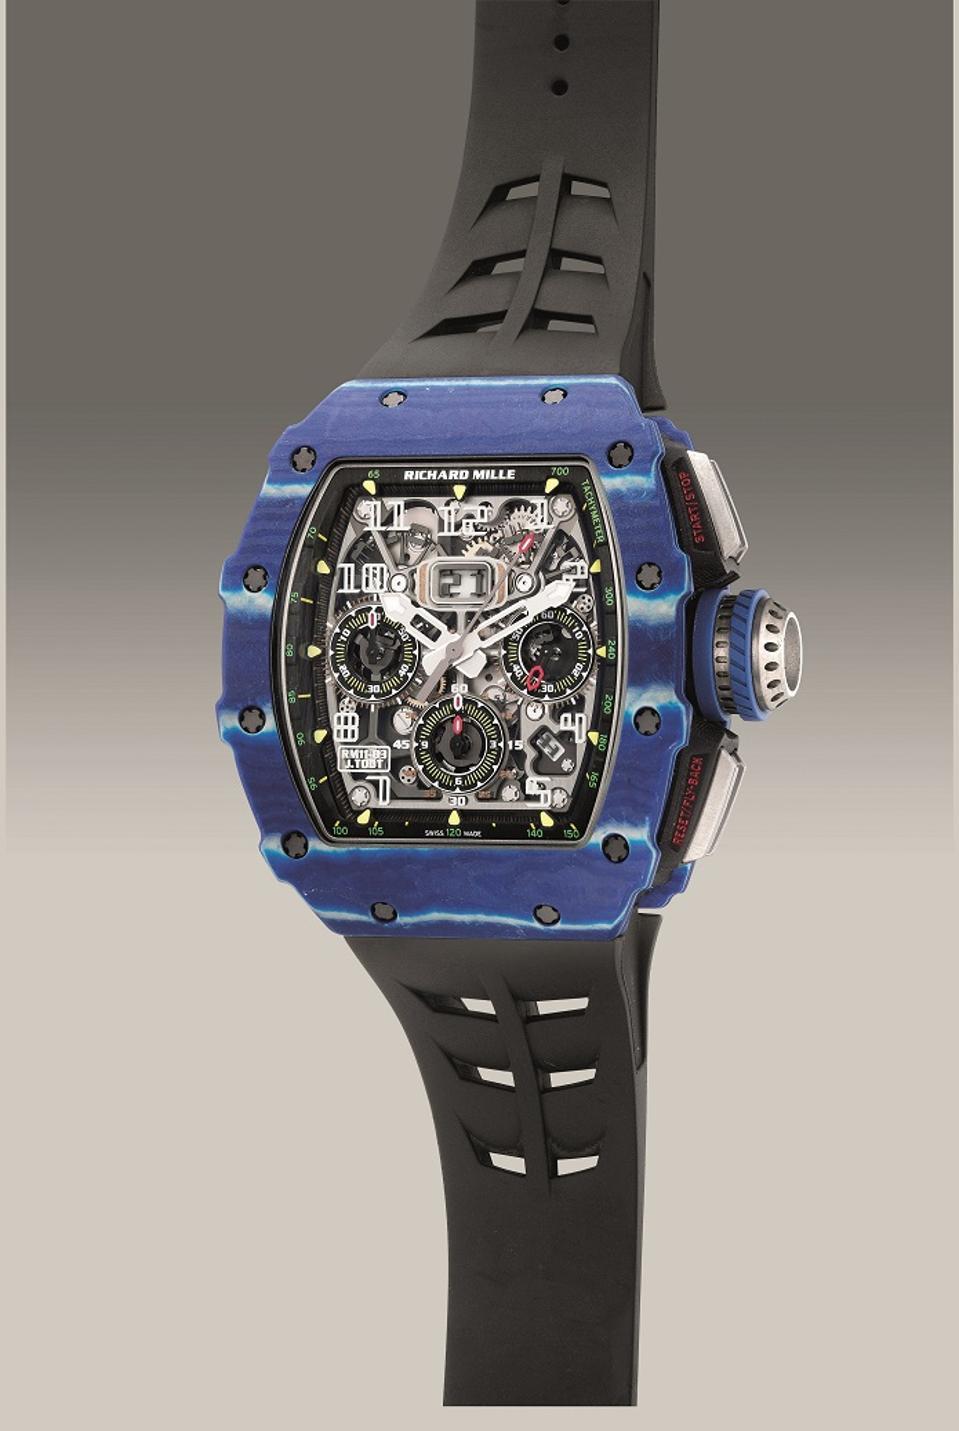 Richard Mille RM11-03 Jean Todt chronograph